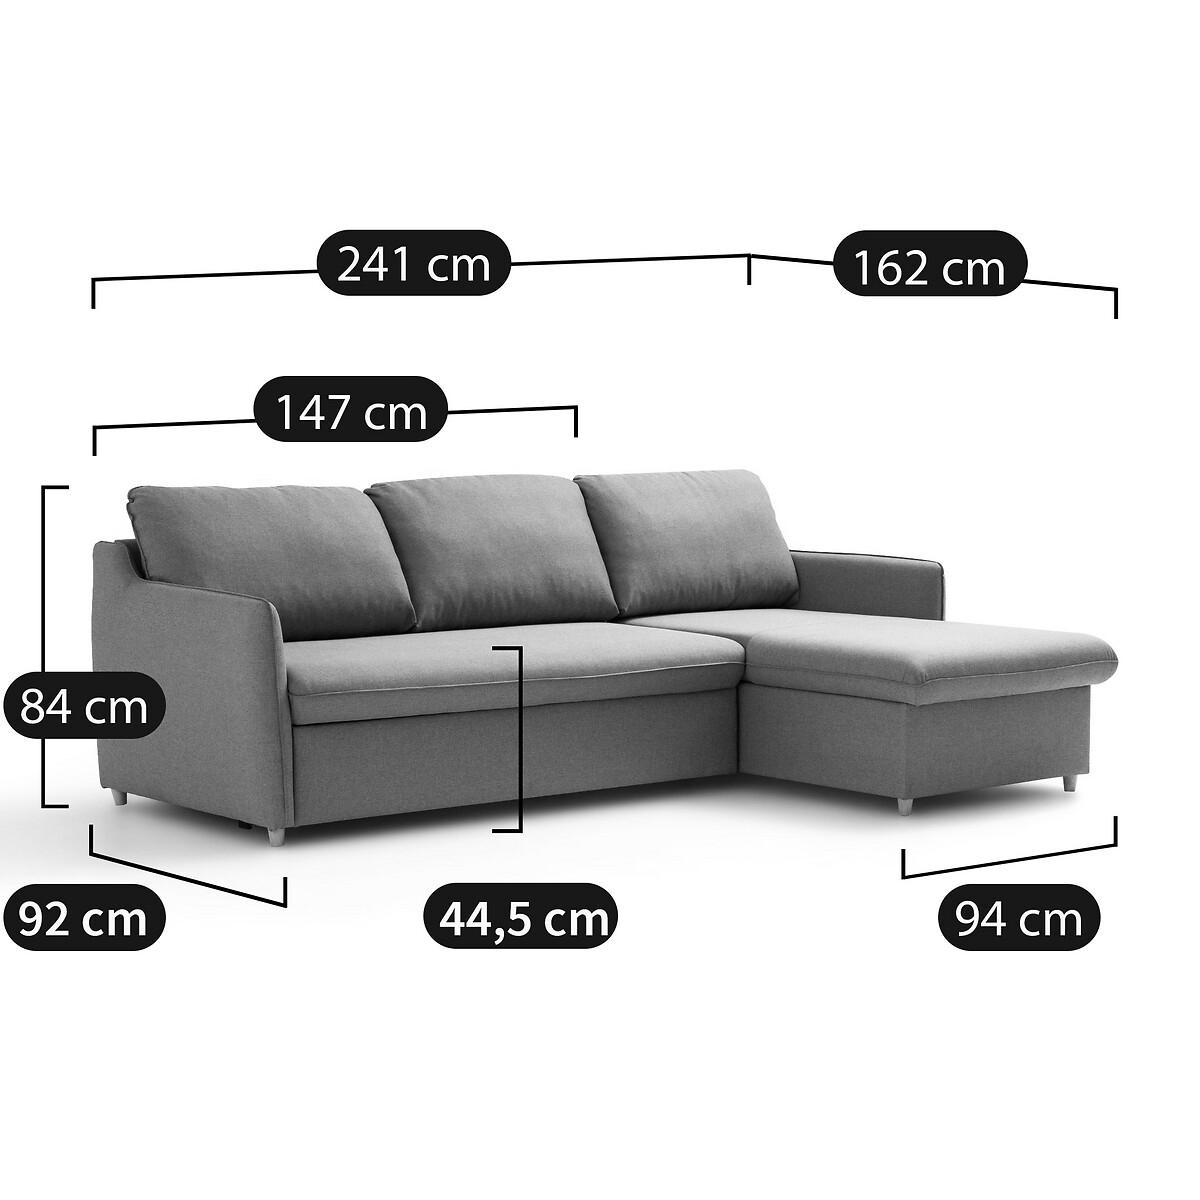 Canapé d'angle Confort